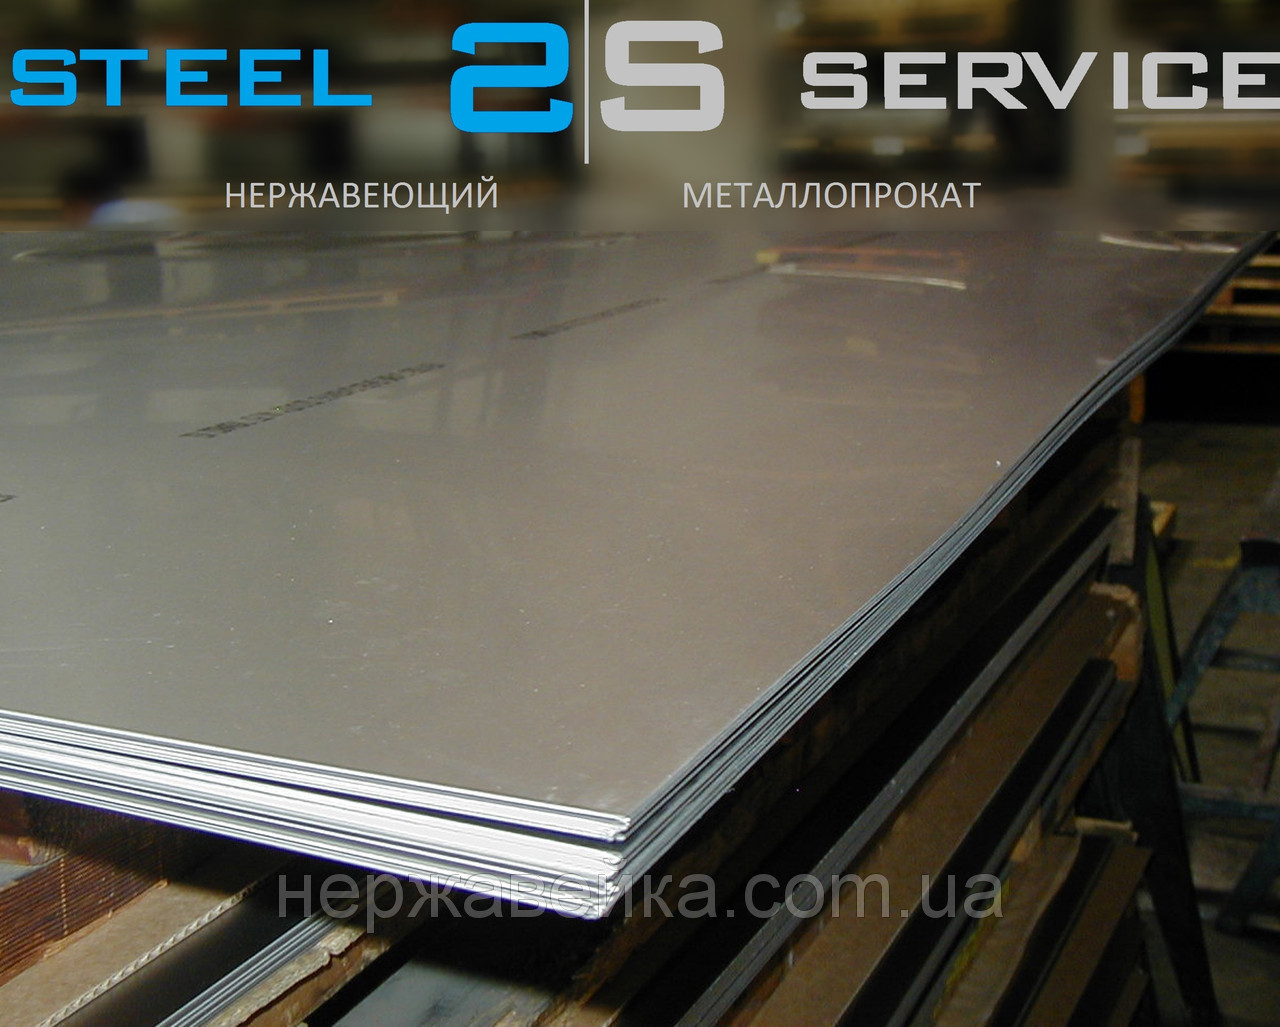 Листовая нержавейка 0,5х1250х2500мм AISI 430(12Х17) BA - зеркало, технический